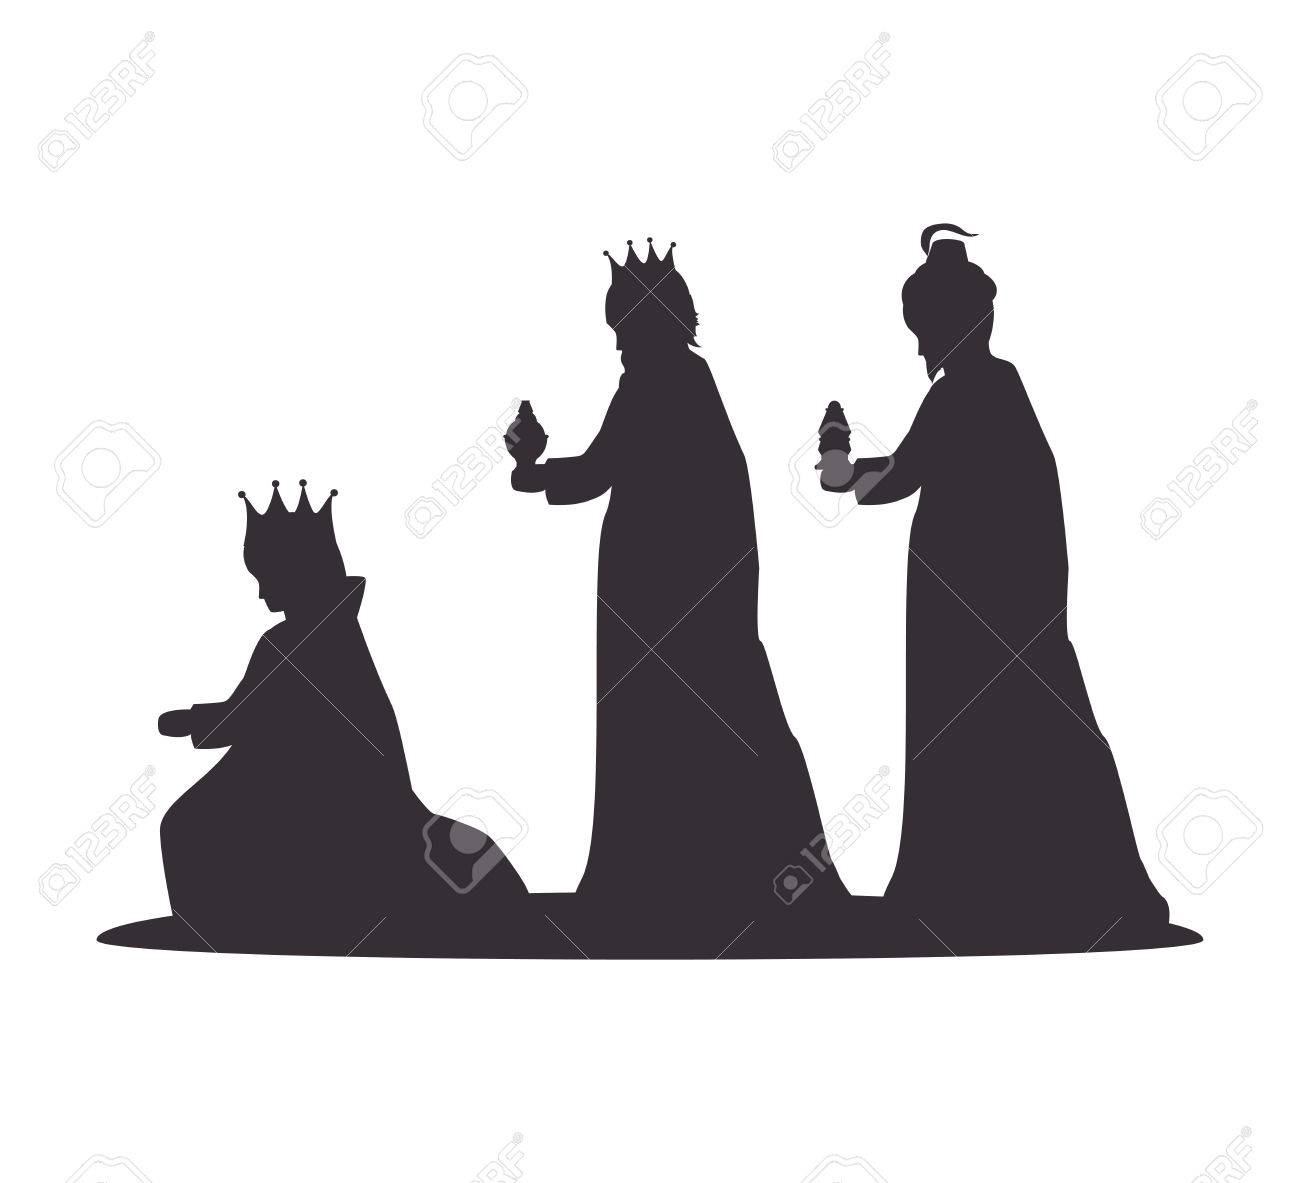 silhouette three wise kings manger design isolated vector illustration eps 10 - 62502771